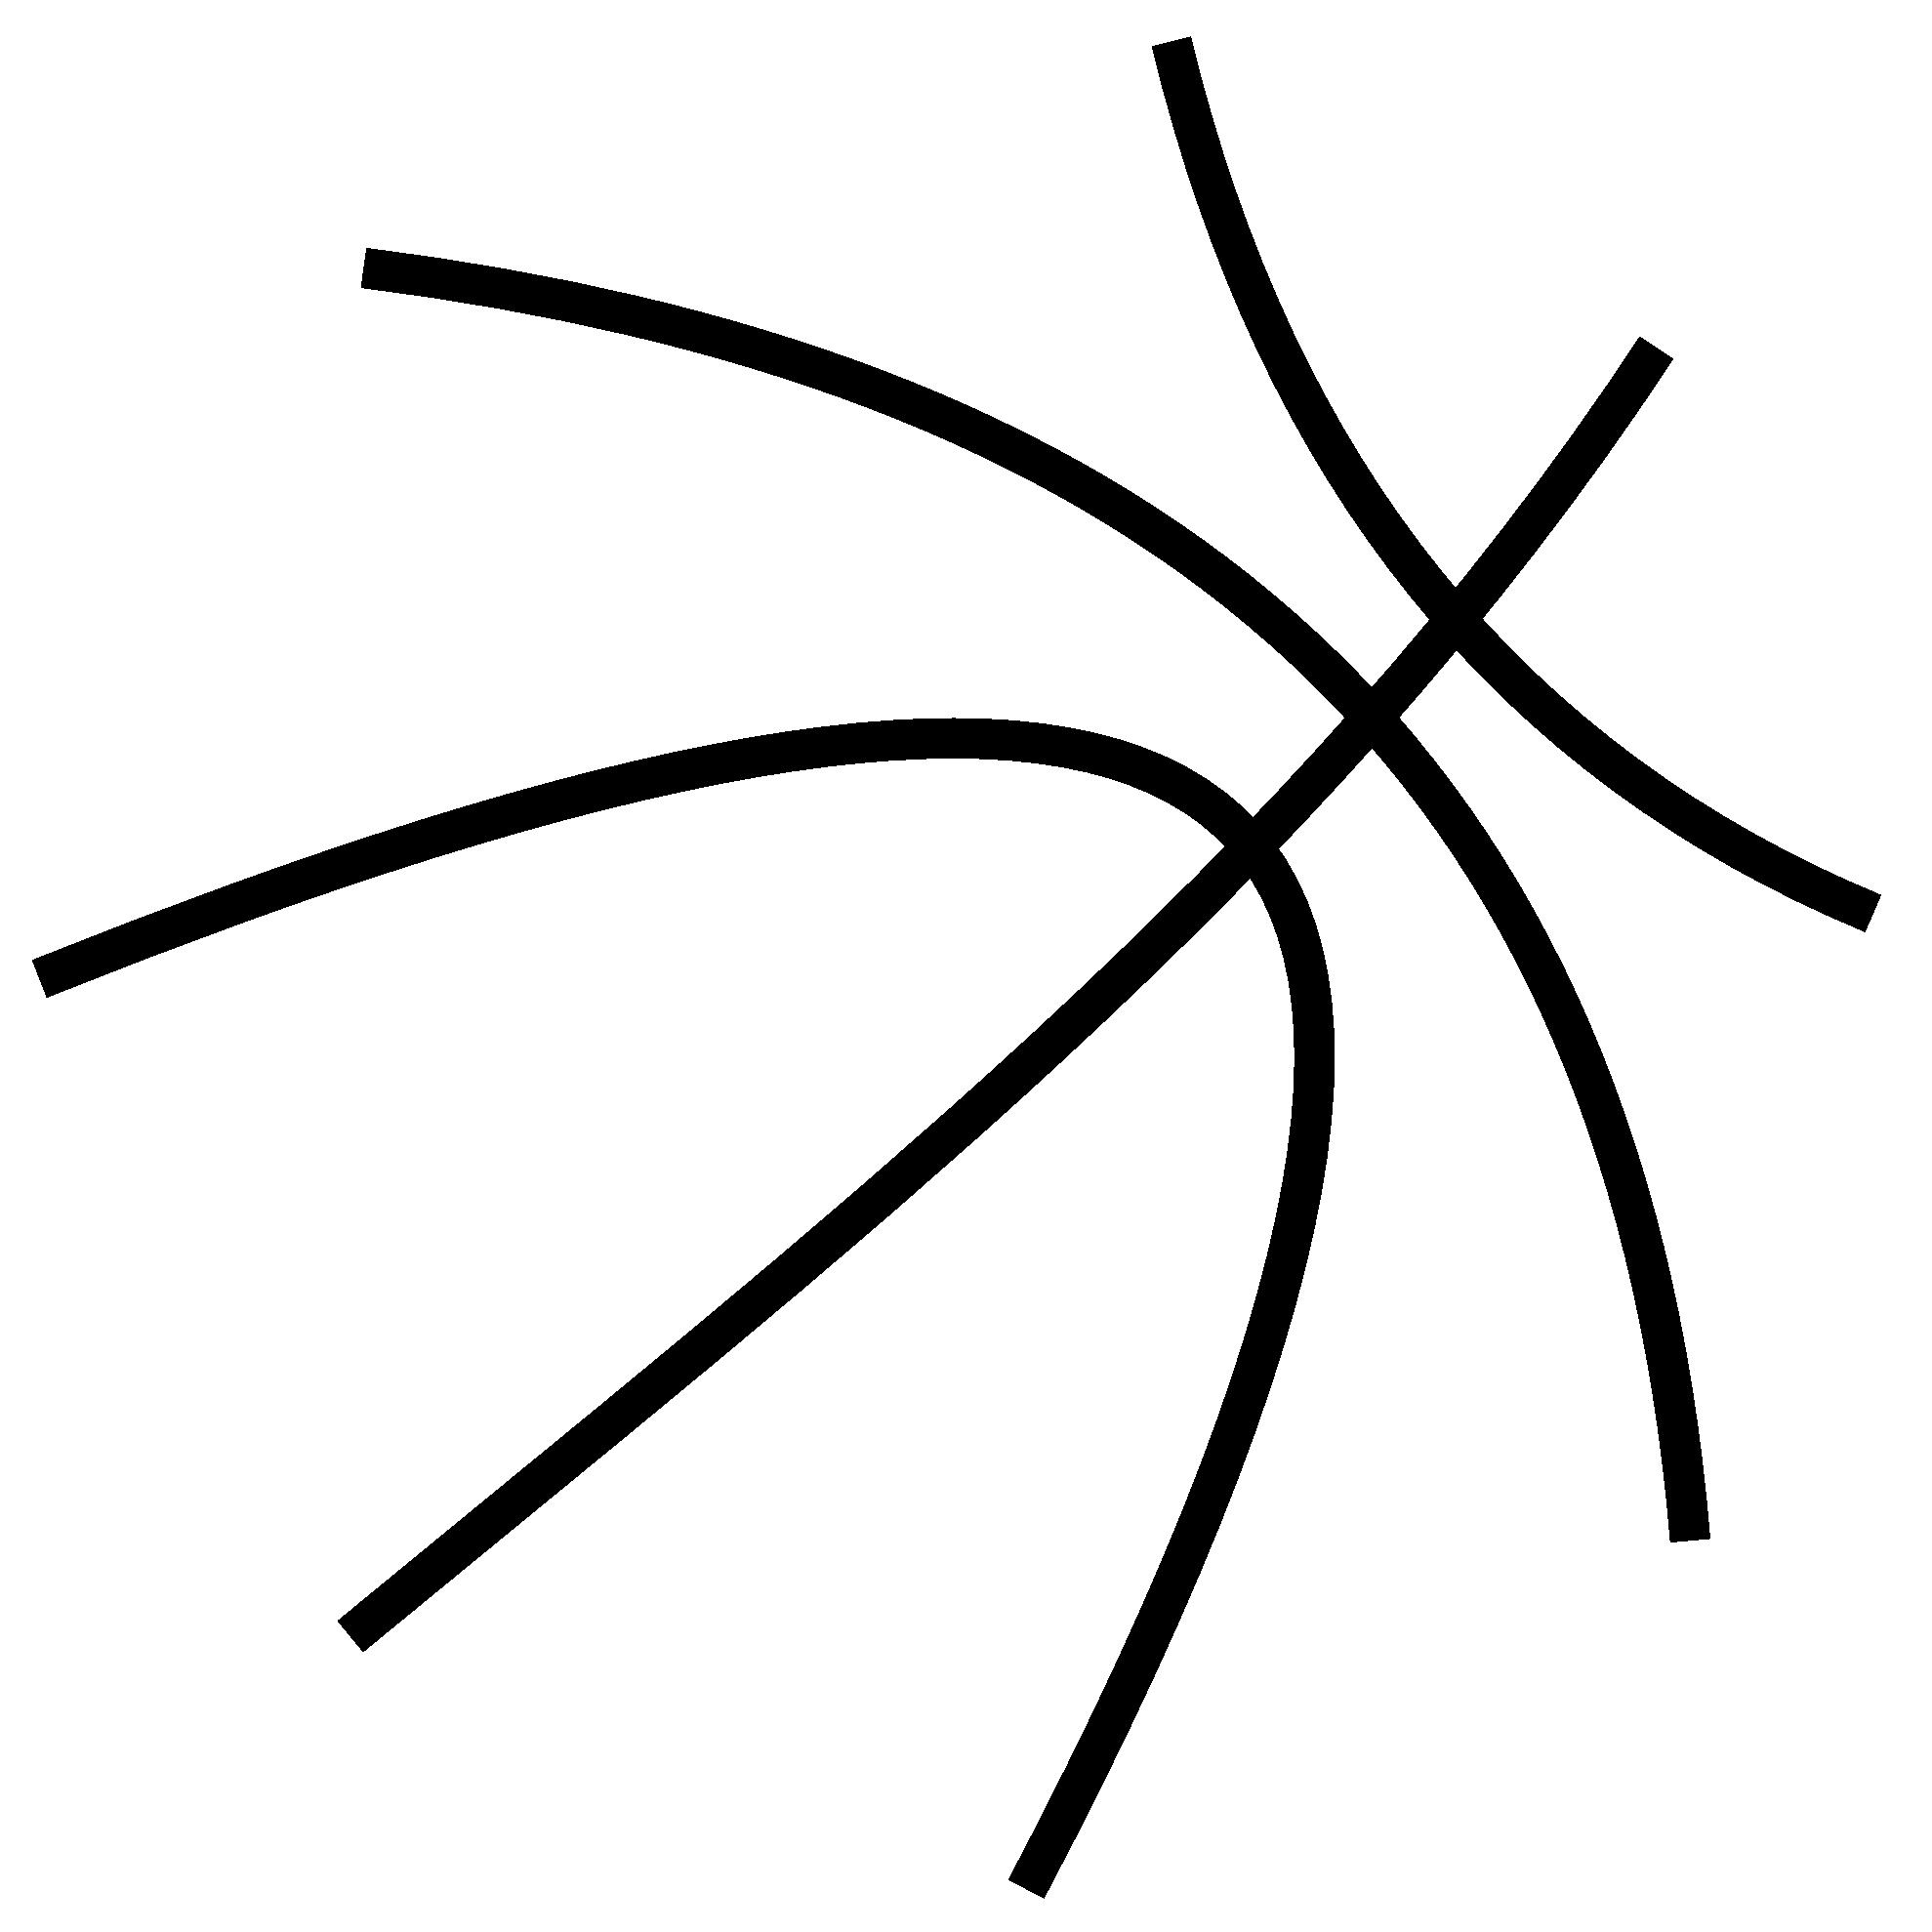 1979x1979 Girls Basketball Clipart Black And White Clipart Panda